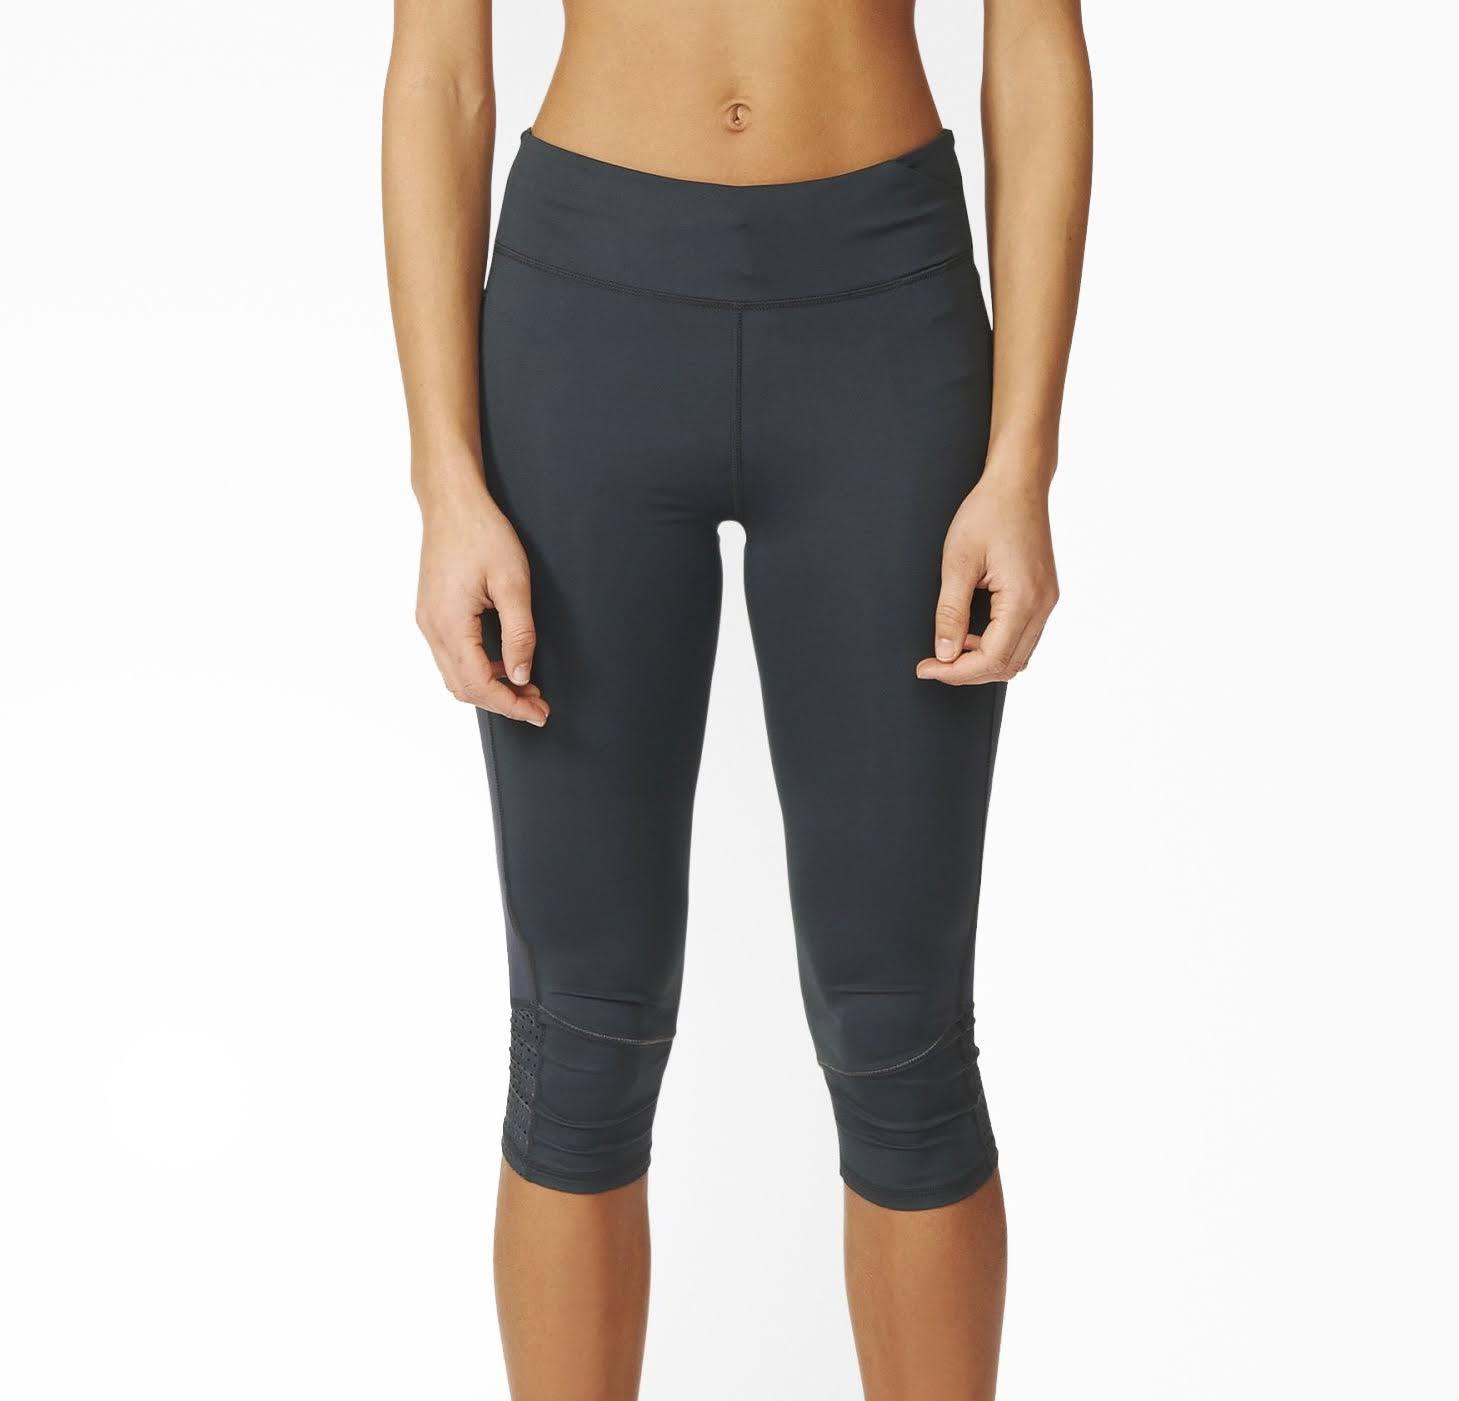 Adidas Supernova 3/4 Capri Womens Running Tights - Grey - Womens, Size XS